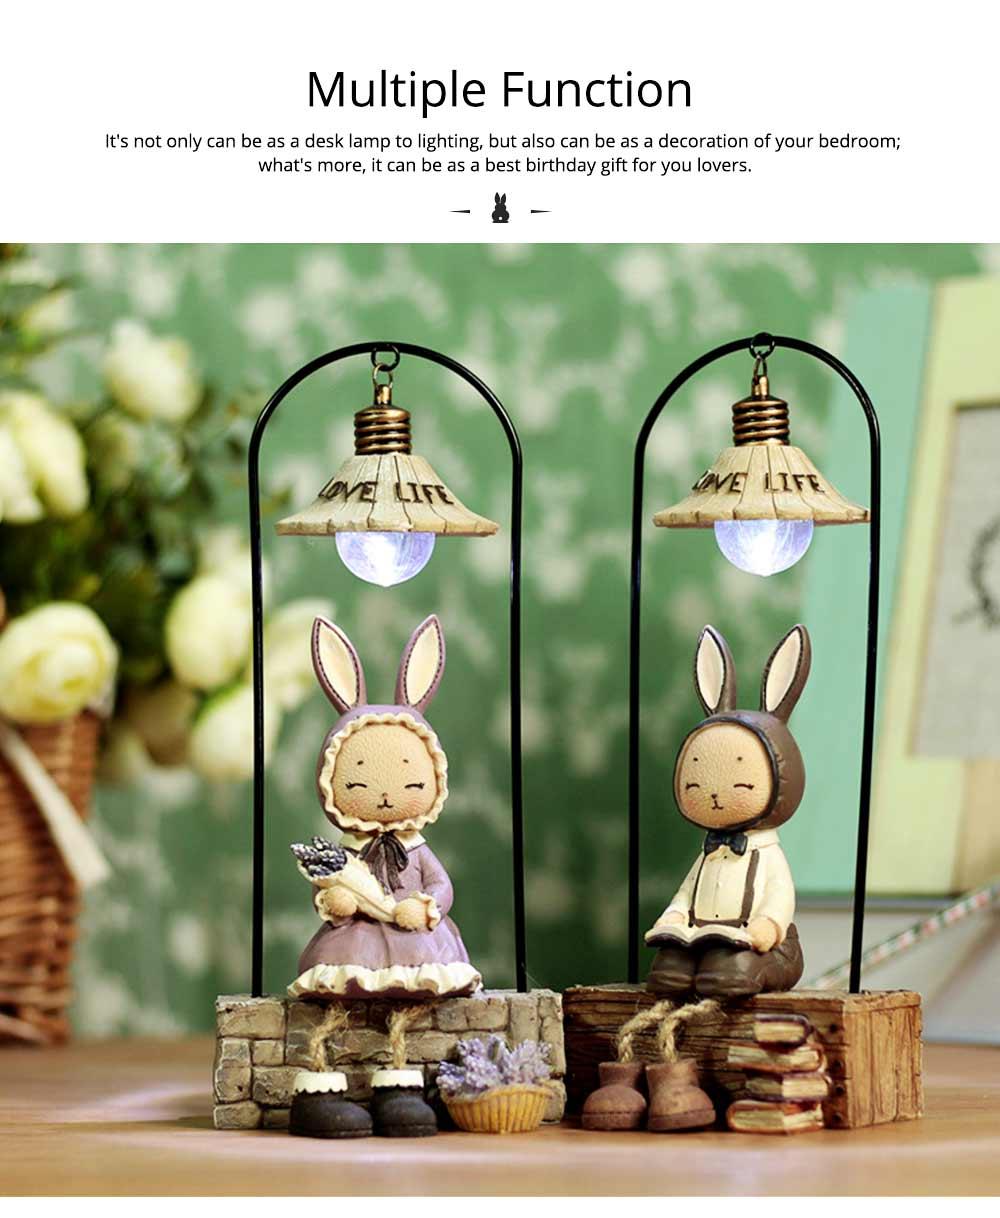 Creative Jenny Rabbit Toy Night Light, Decorative Table Lamp Birthday Gifts for Kids Baby Girls Boys 16